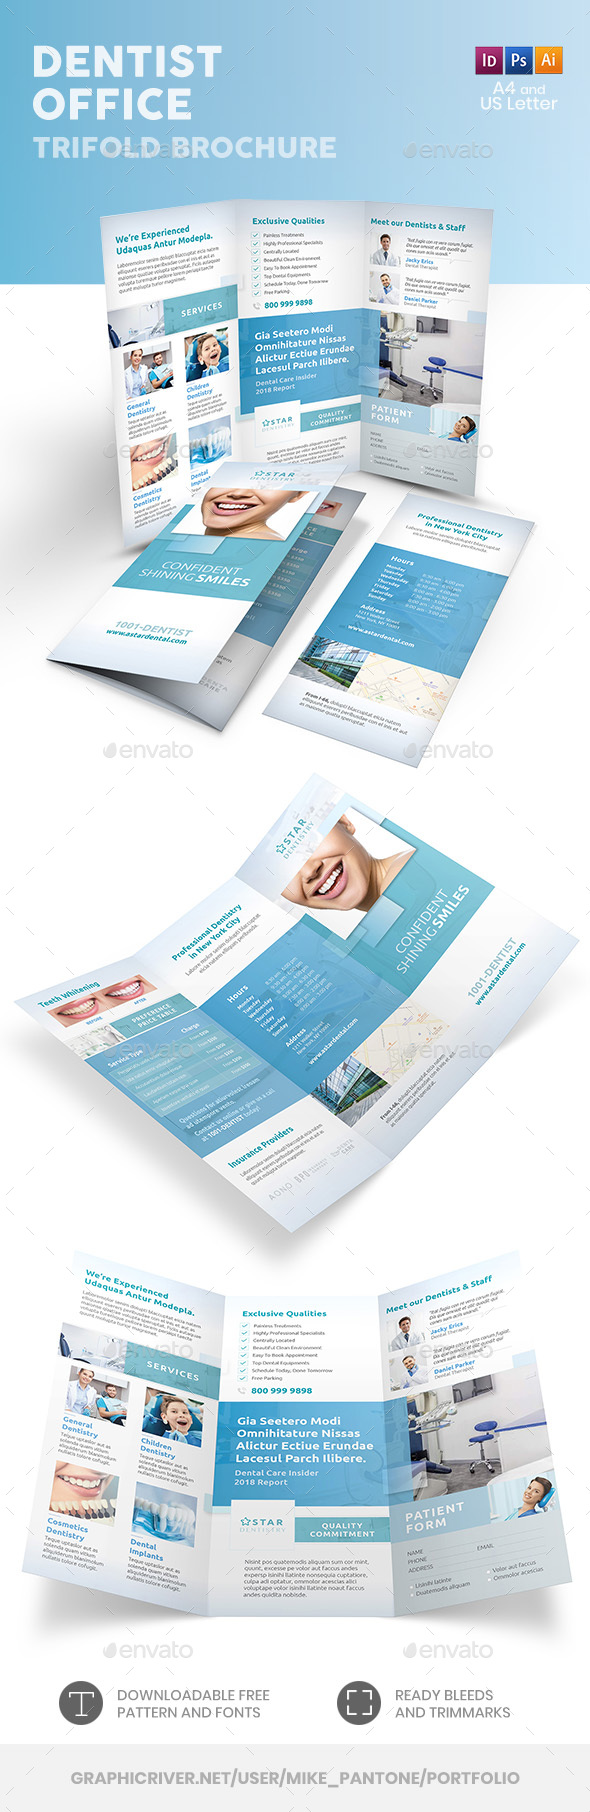 Dentist Office Trifold Brochure 6 - Informational Brochures